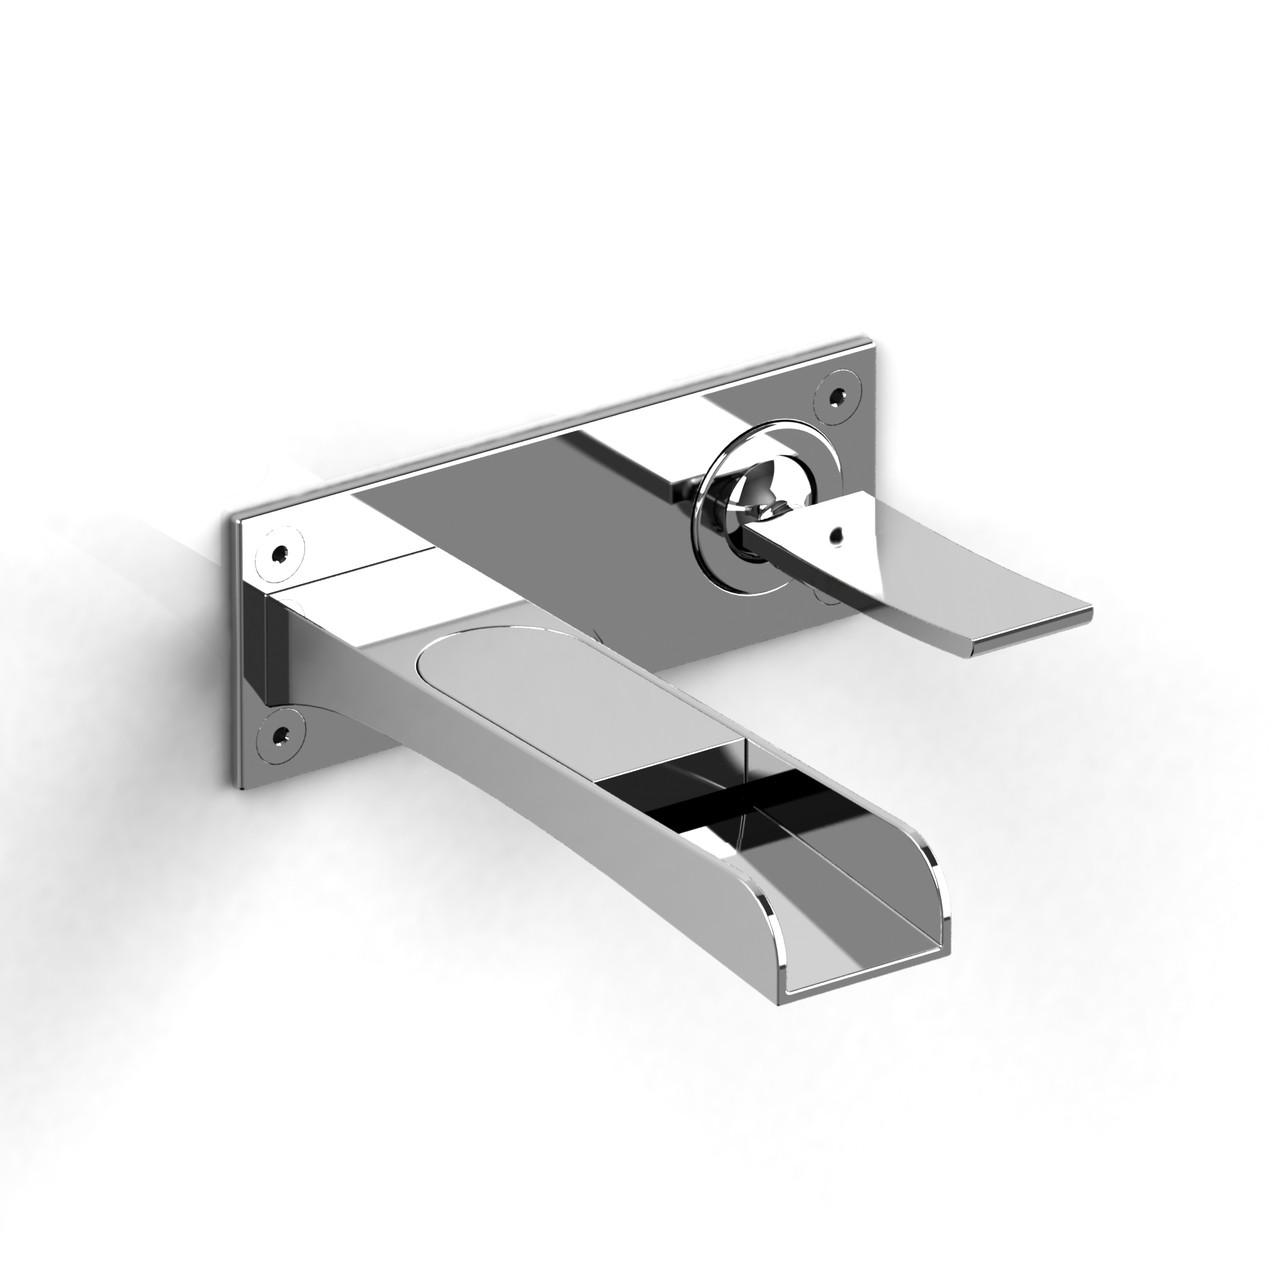 riobel zendo wall mount lavatory open spout faucet